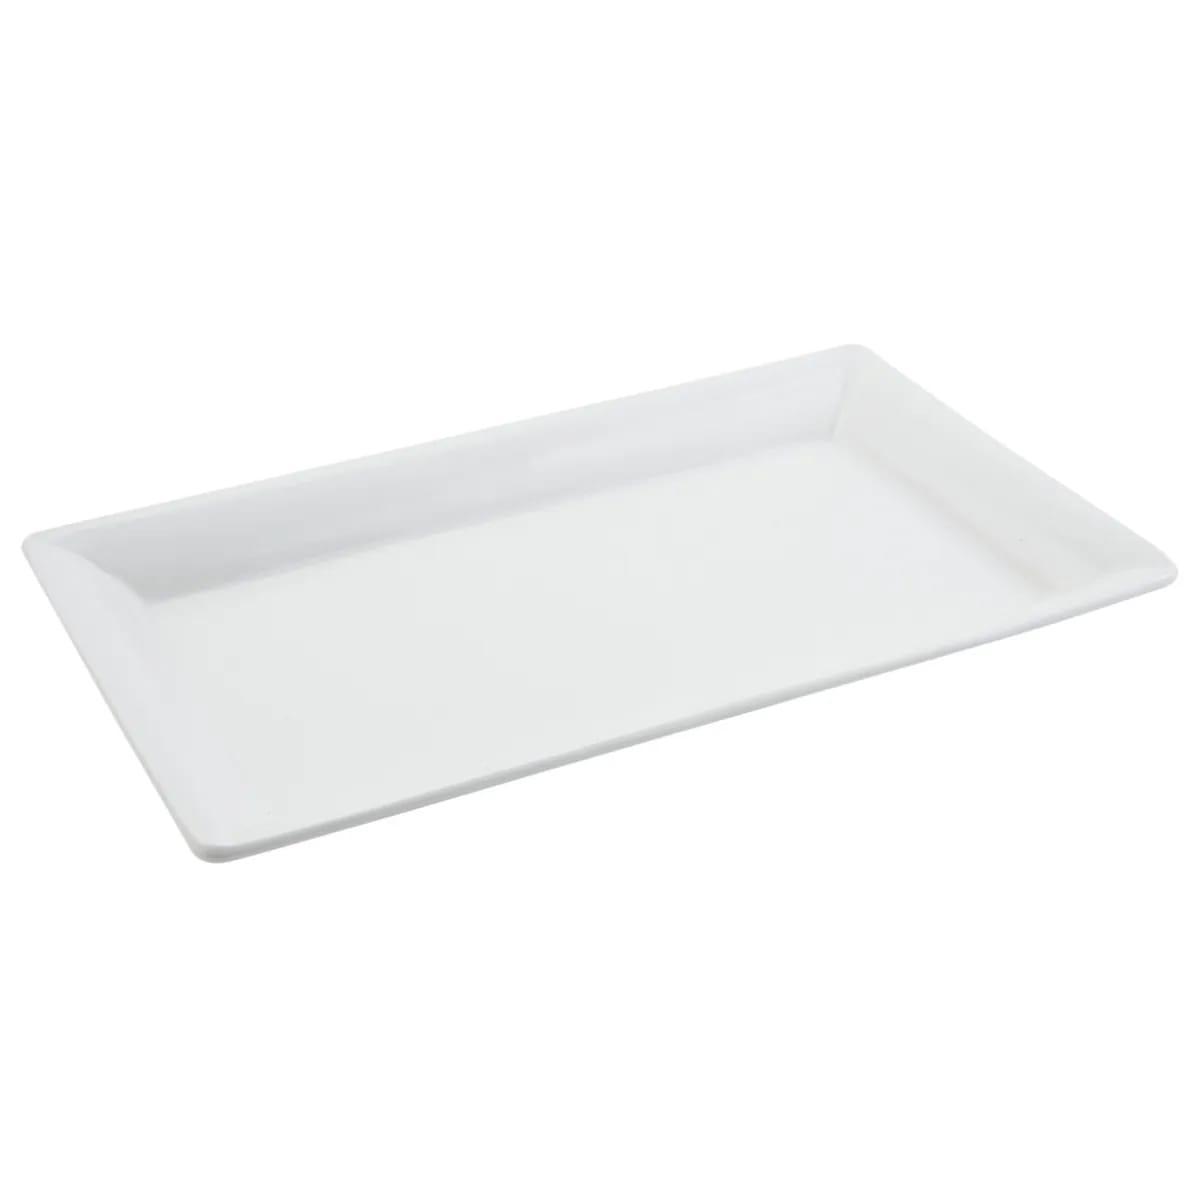 "Bon Chef 5057S Buffet Display Pan, 10-3/8 x 19-3/16"", Aluminum/White"